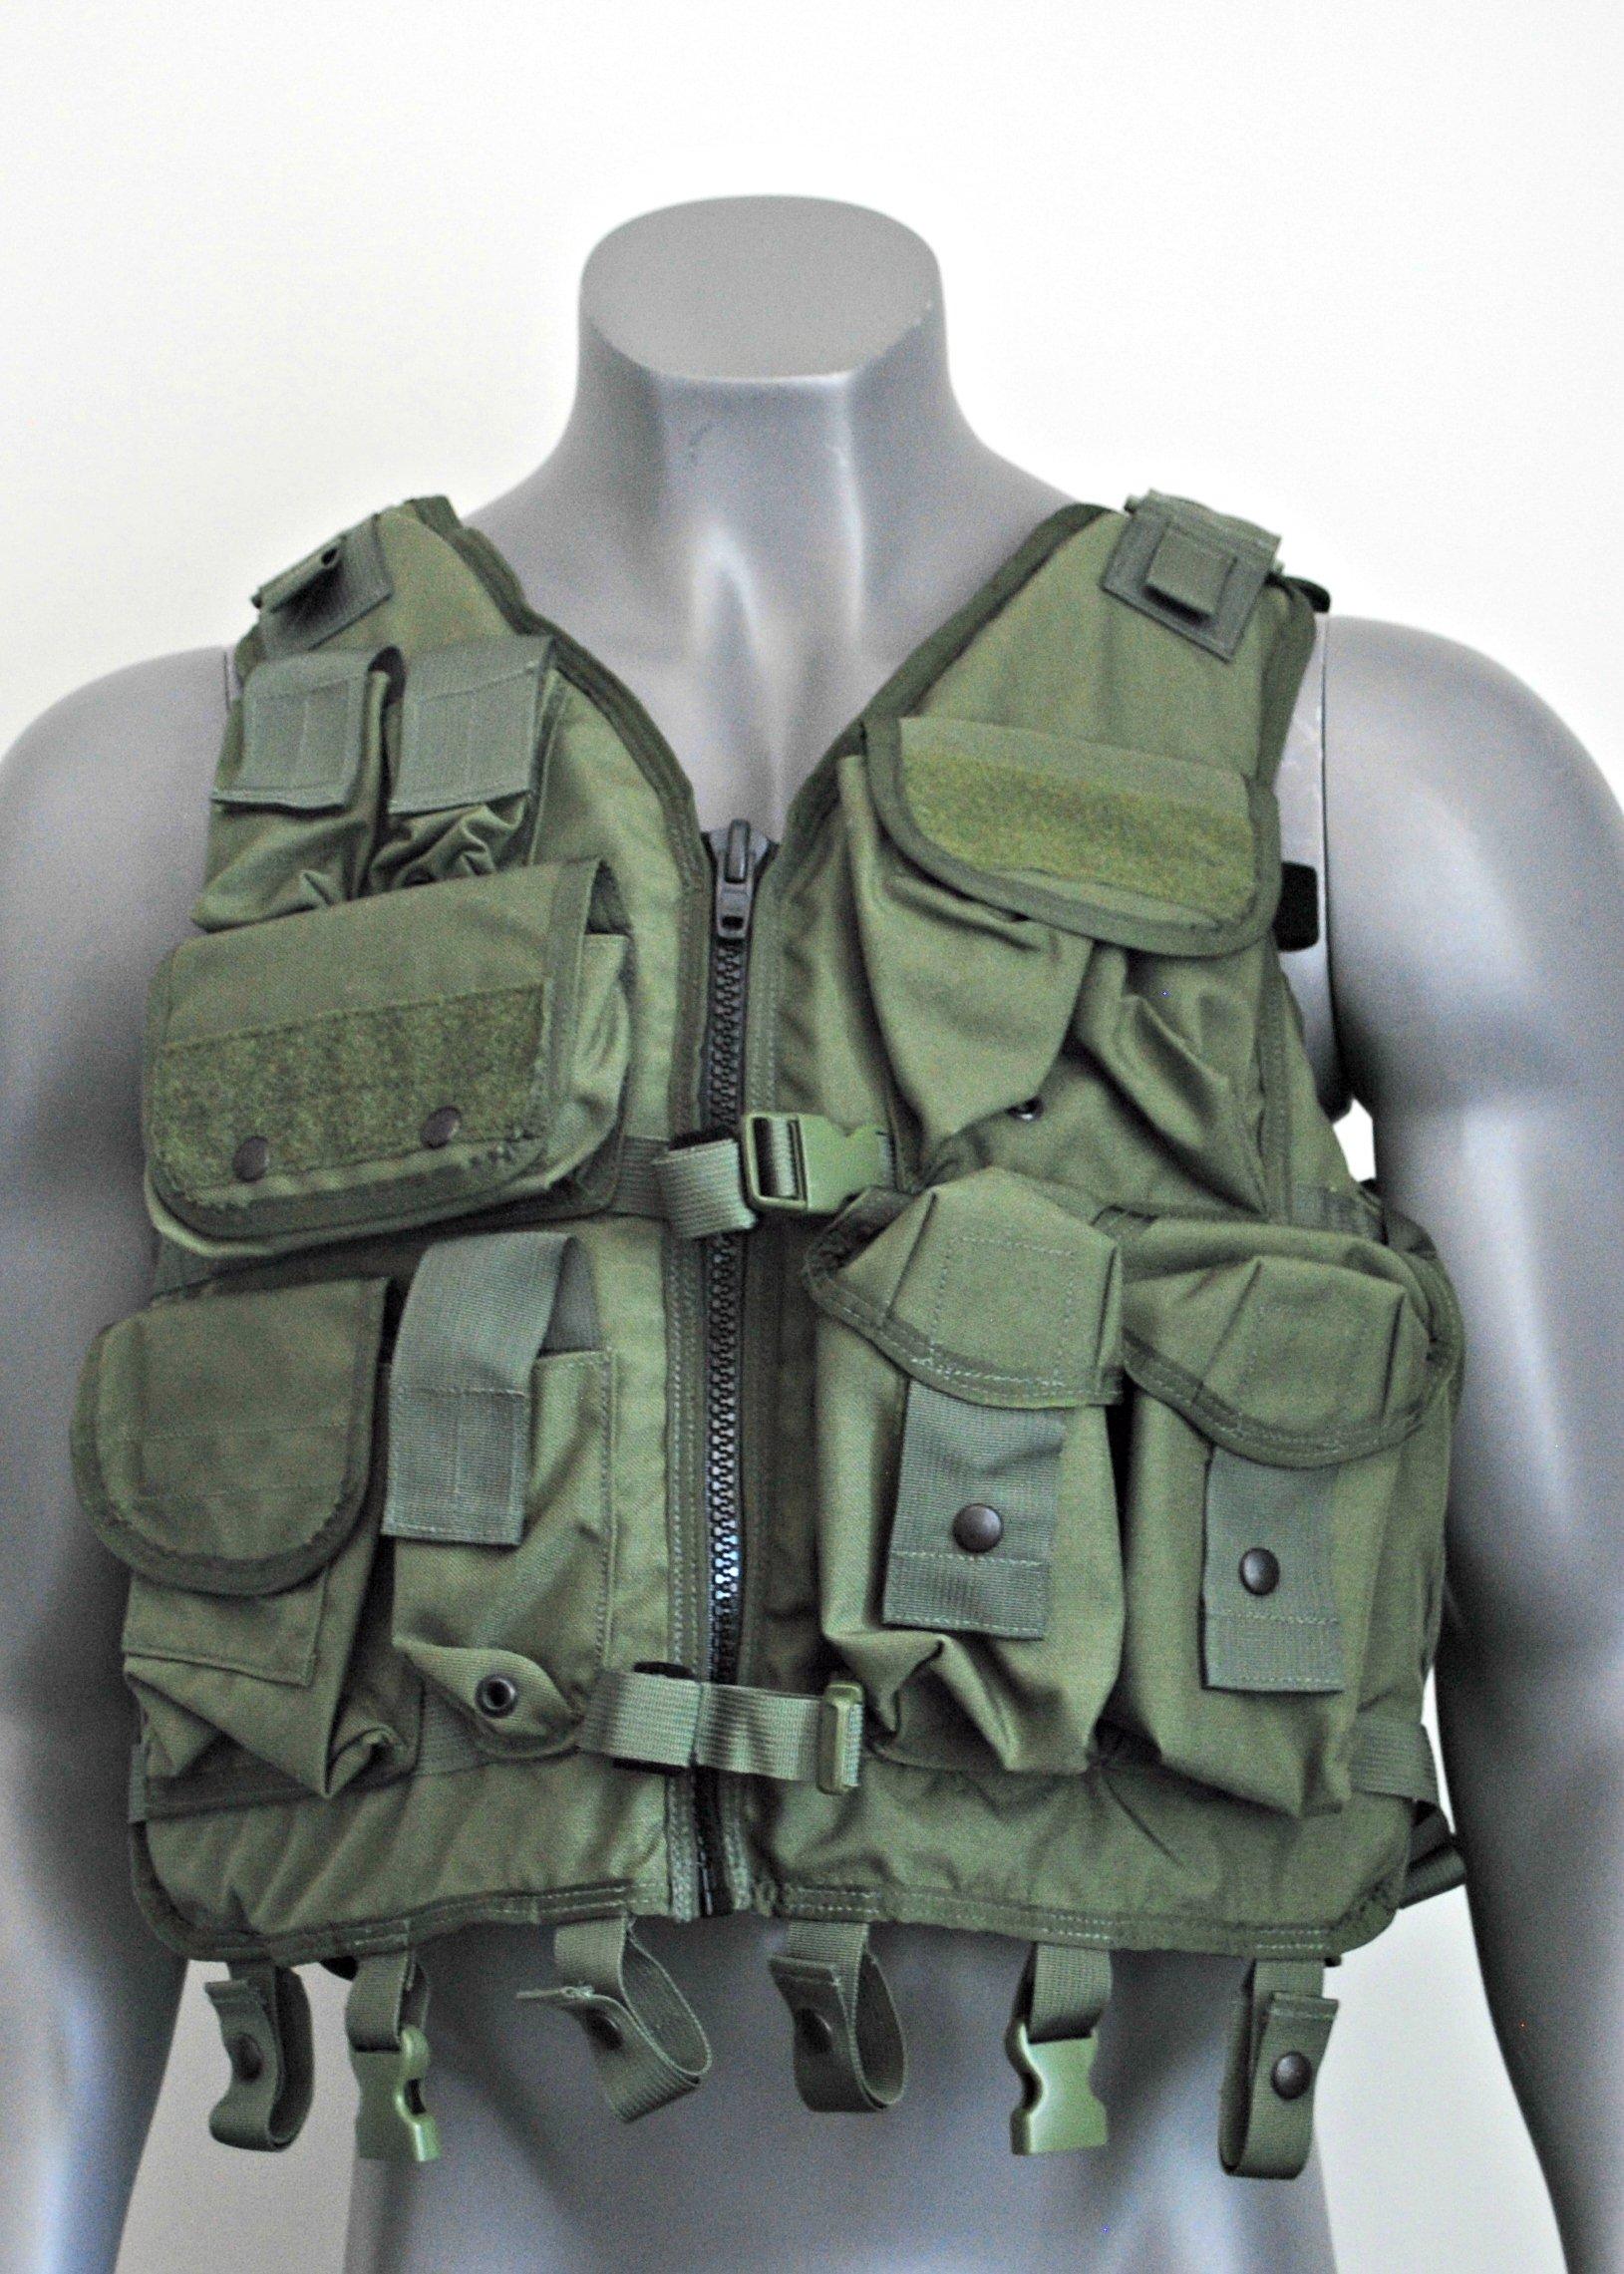 Tactical Vest w/ Flotation OLIVE DRAPE LBT-1620A-ROD by LBT